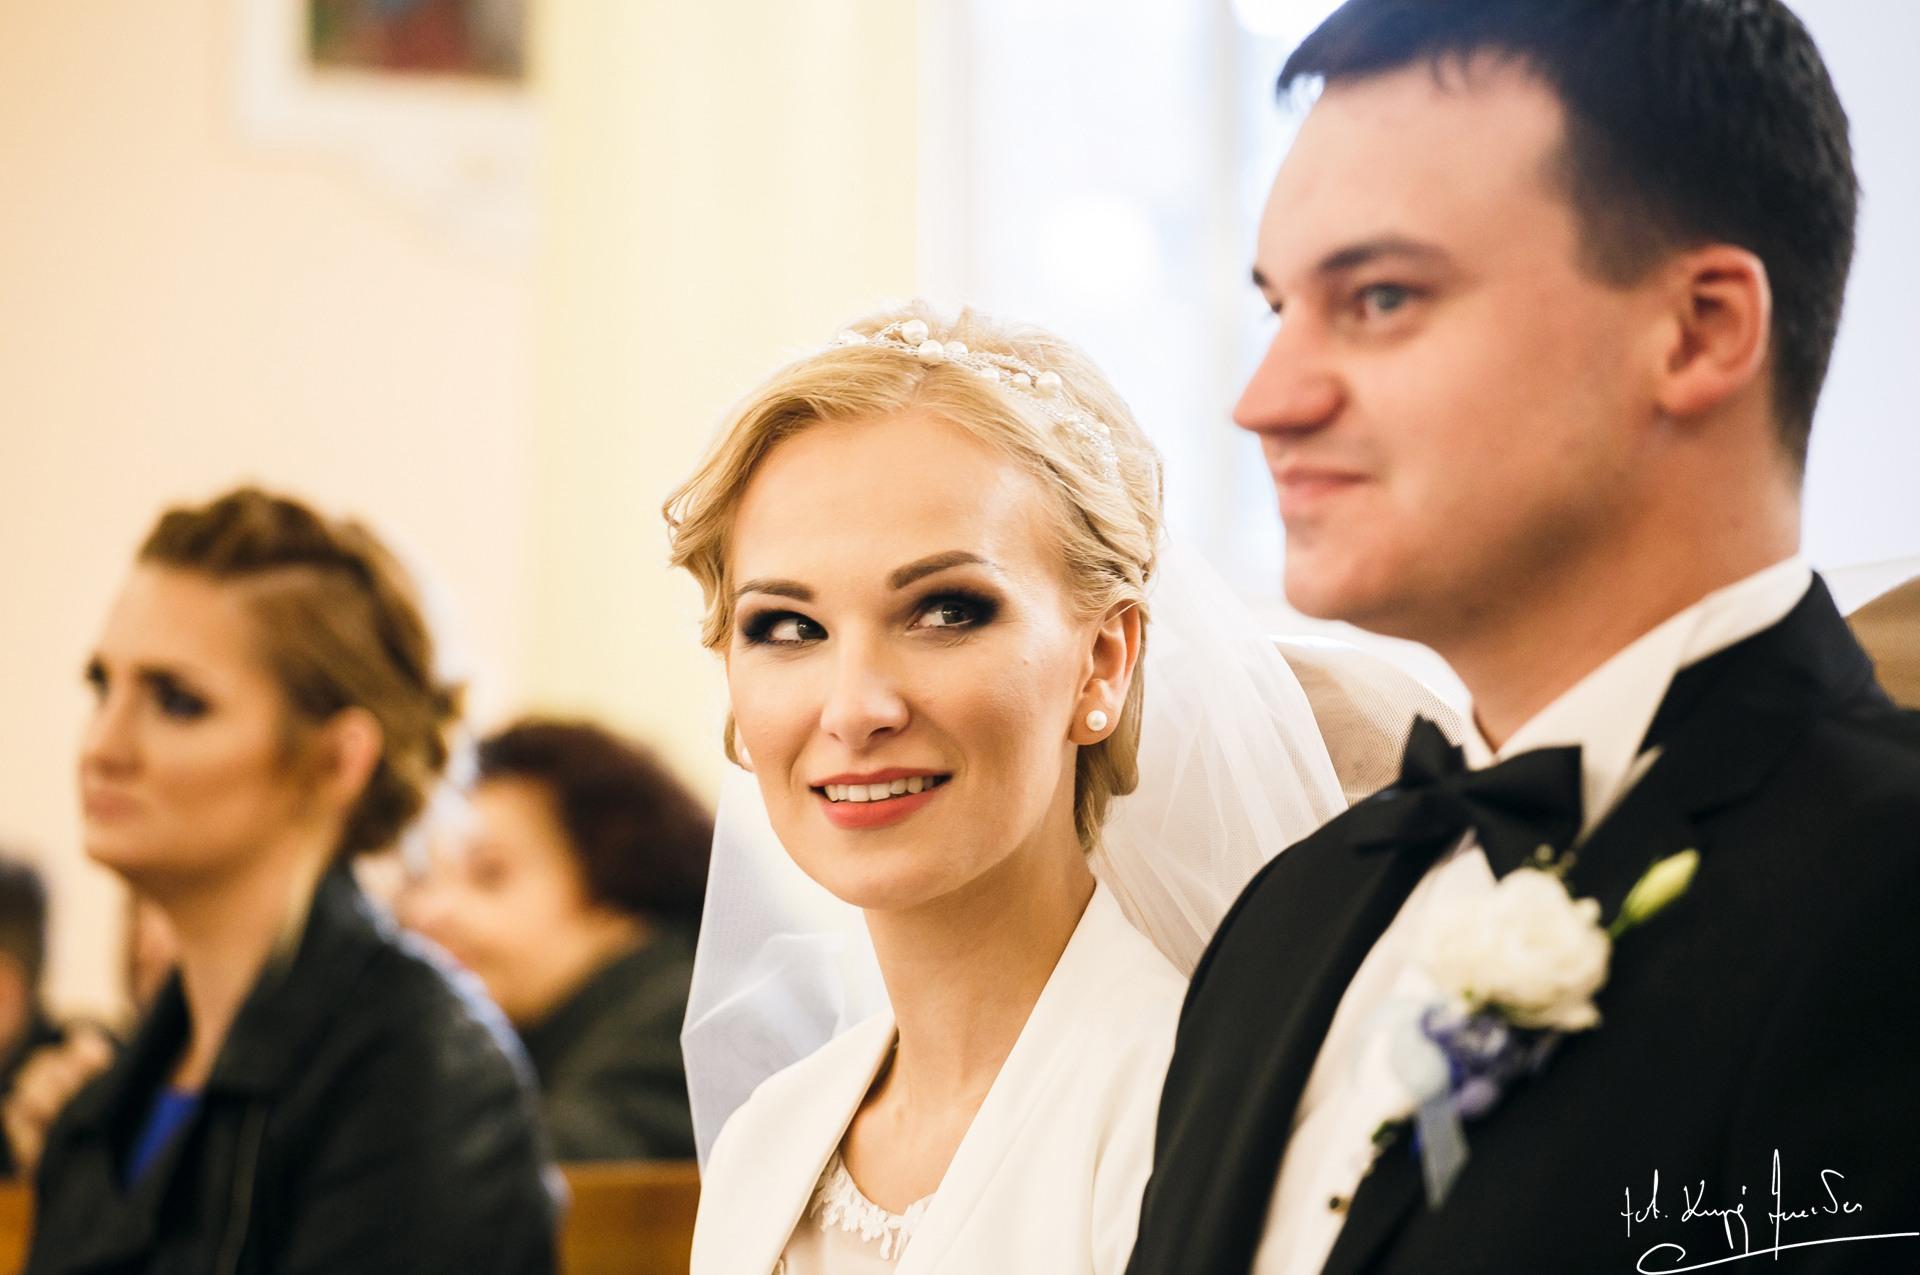 Jawor 60 Lidia & Piotr